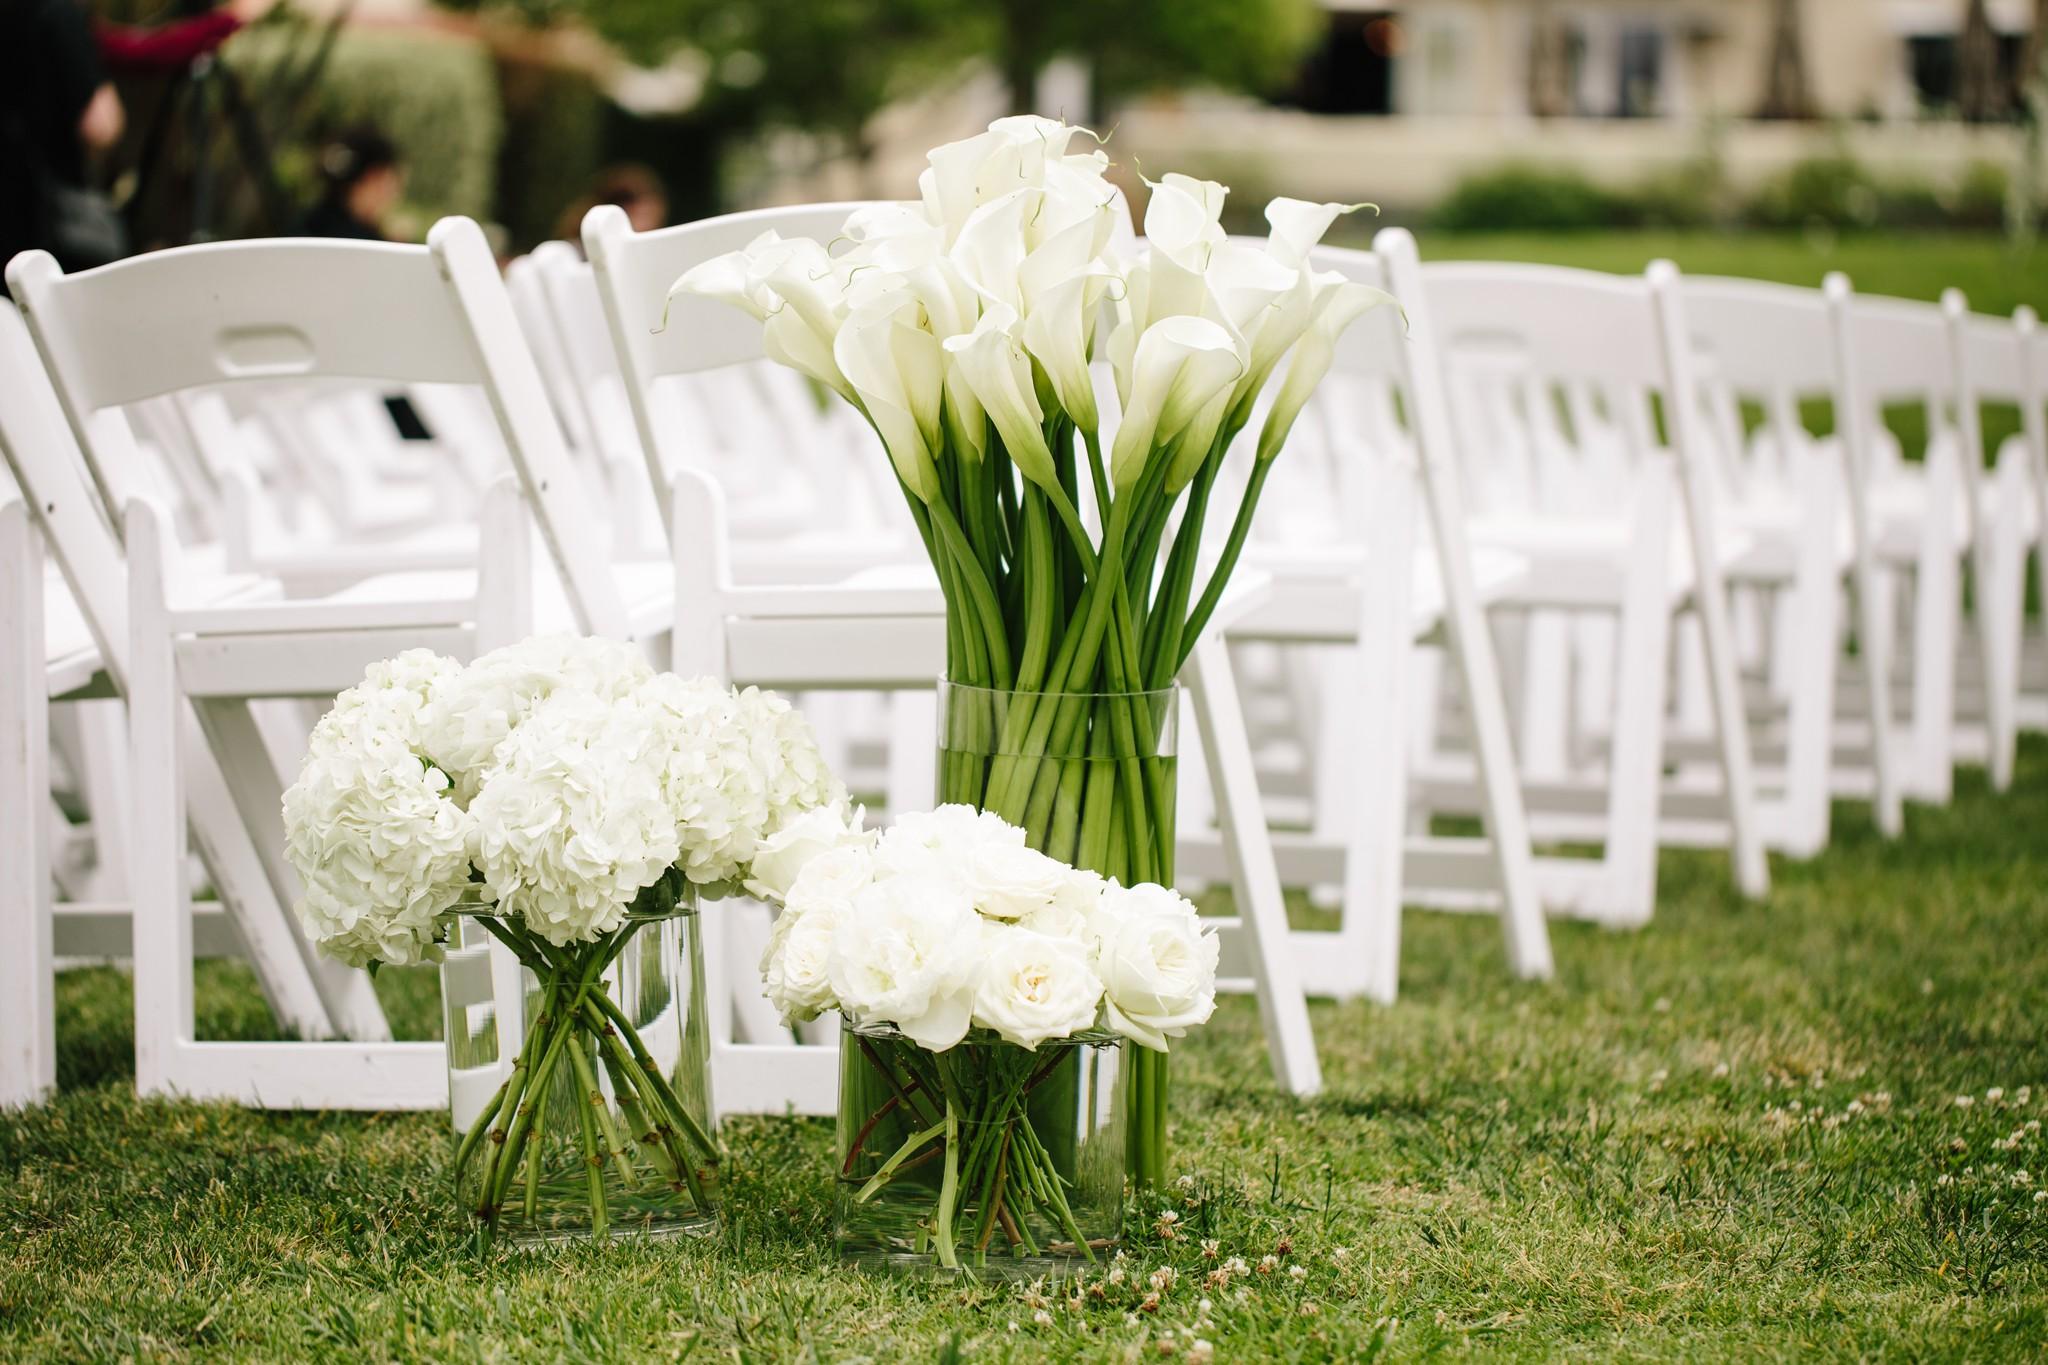 126 THEDELAURAS_THE_INN_AT_RANCHO_SANTA_FE_WEDDING_CEREMONY FLOWERS_BLOG126.jpg